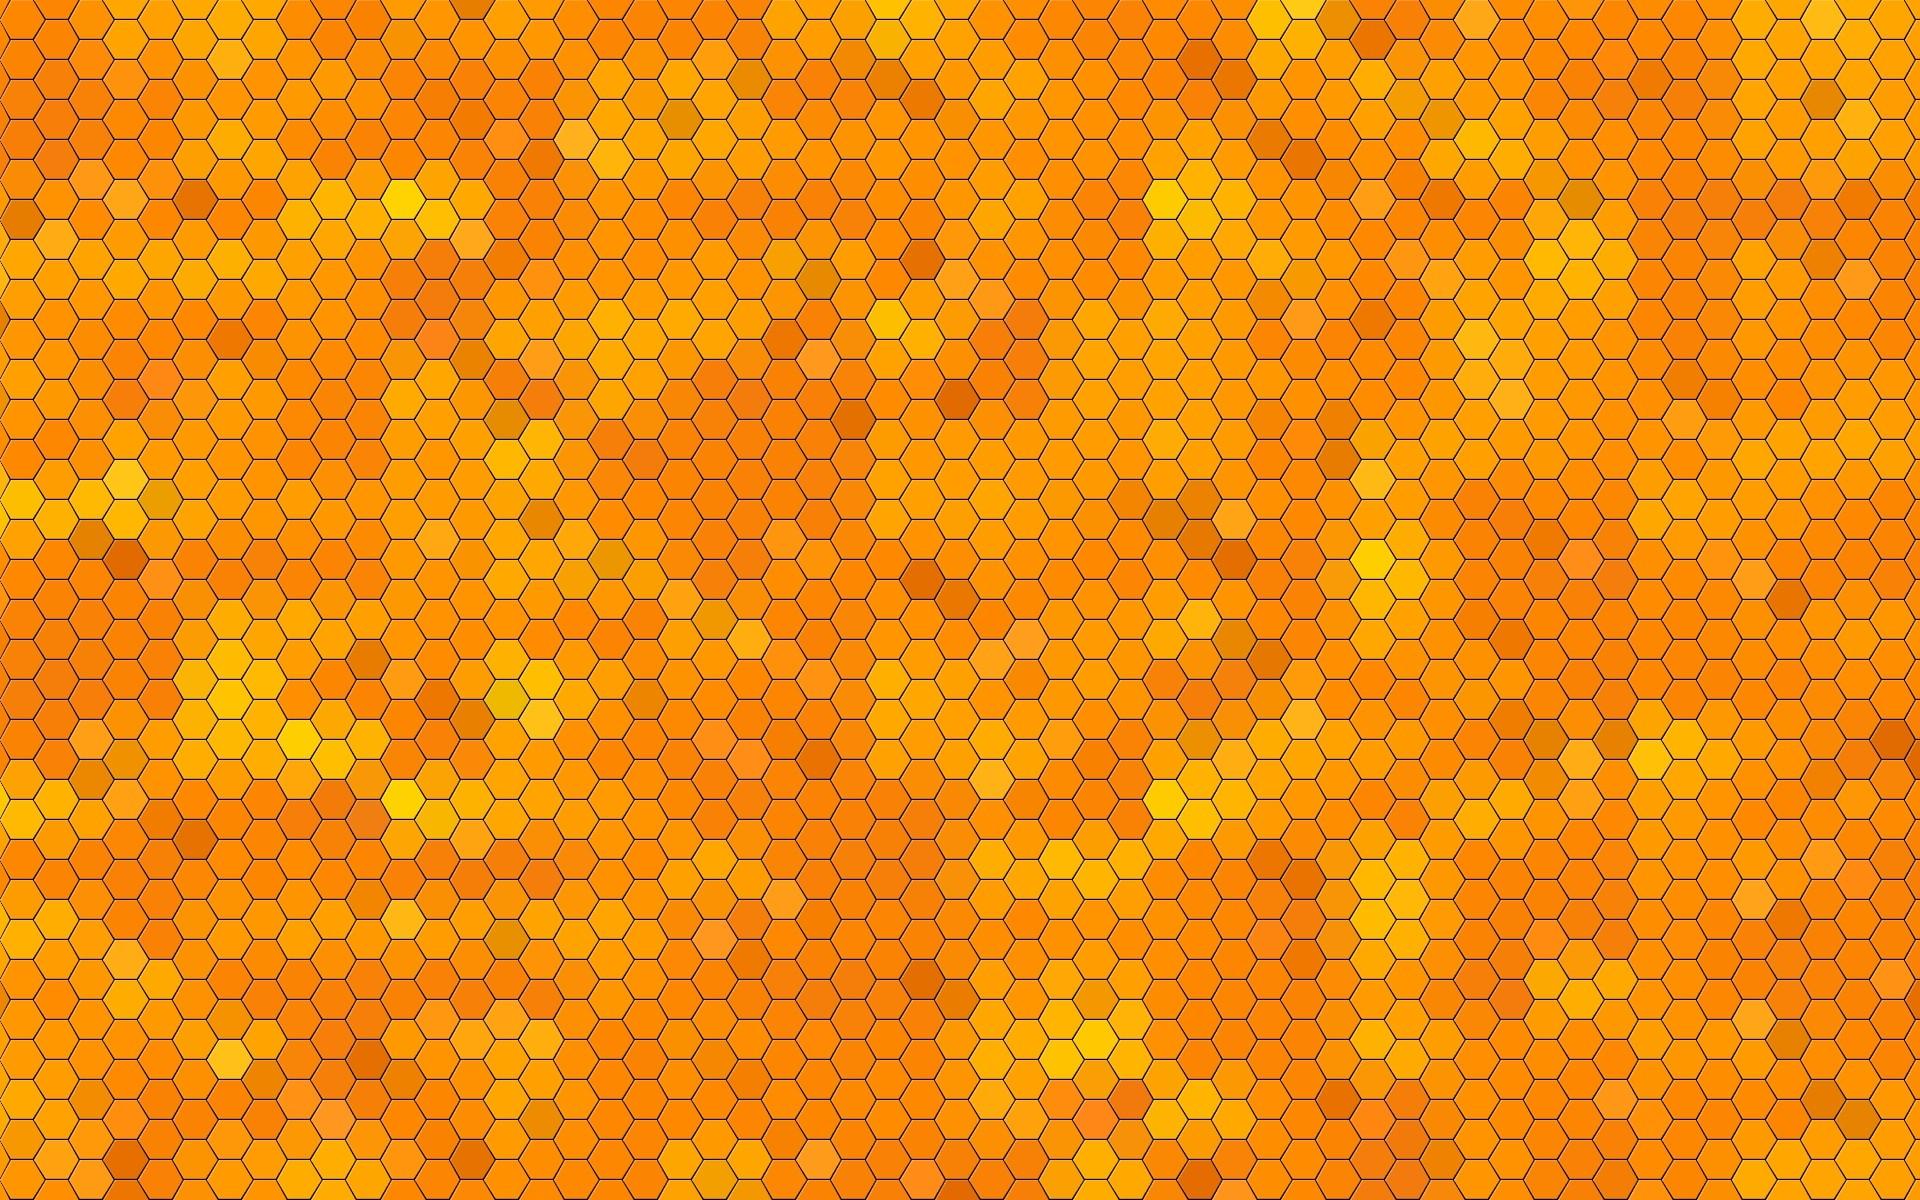 Wallpaper : sunlight, yellow, pattern, orange, texture